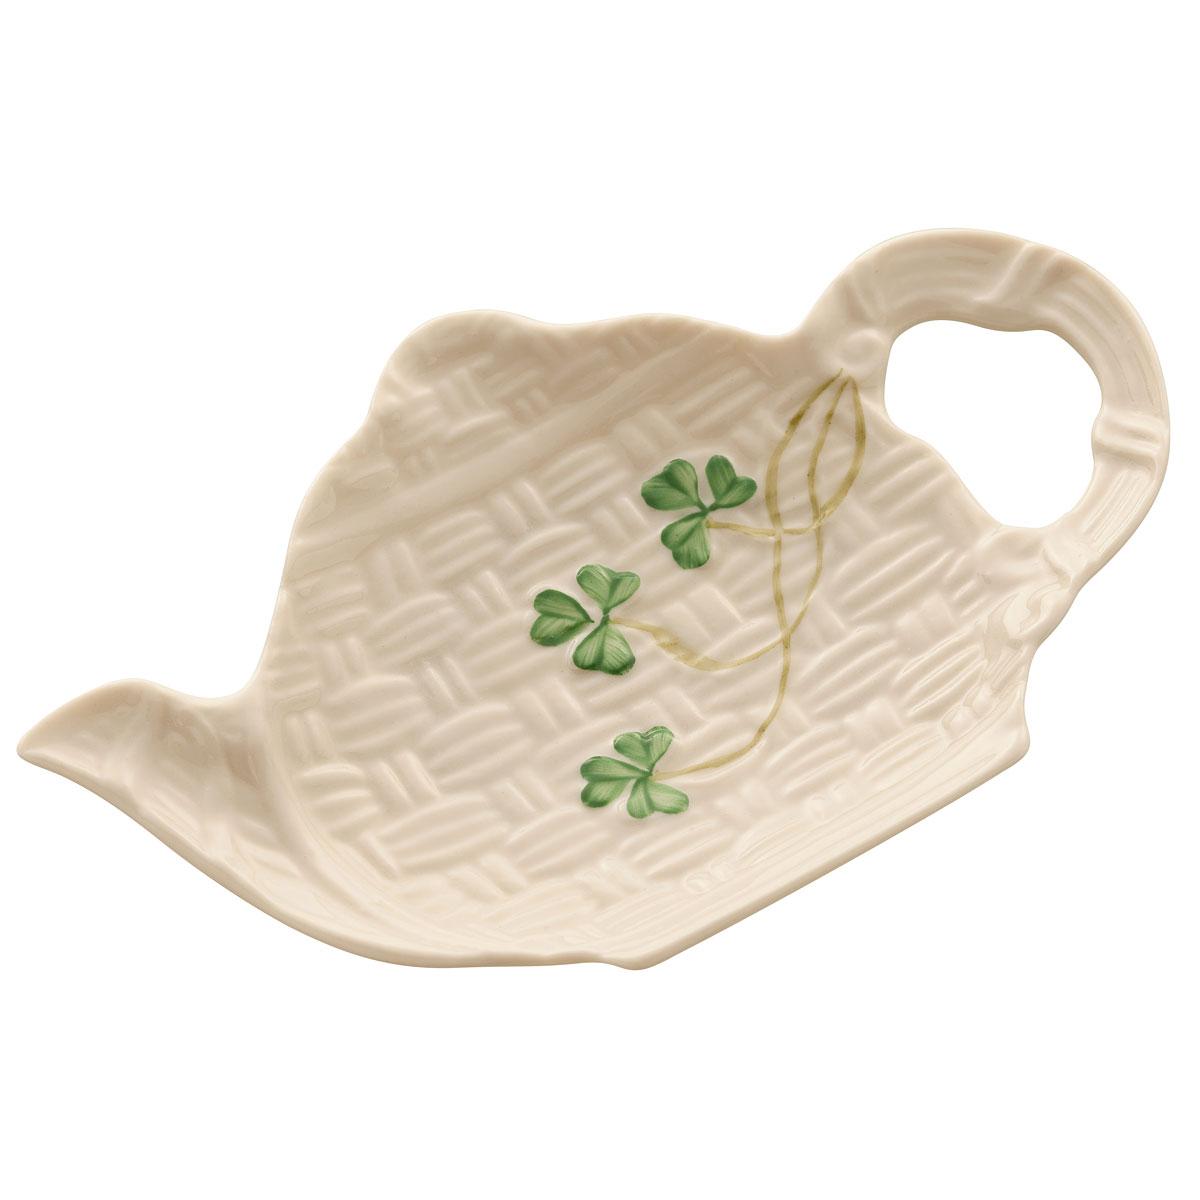 Belleek China Shamrock Teapot Spoon Rest Holder